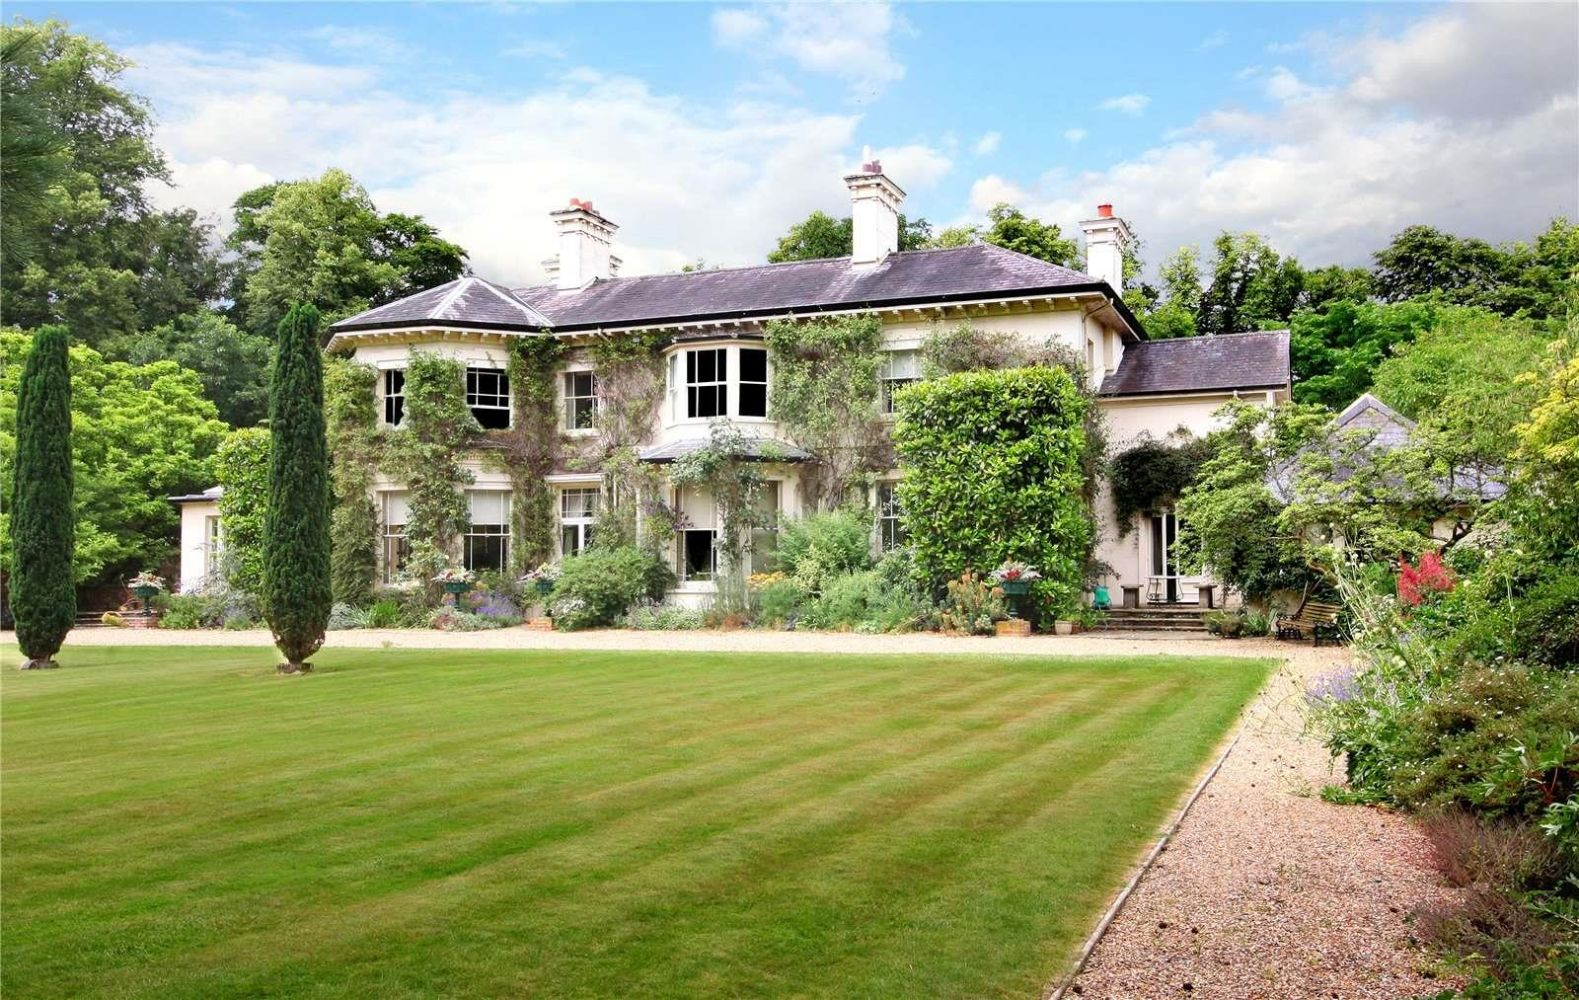 The Sally Hunter and Ian Posgate Collection, Badgemore Grange - Sworders